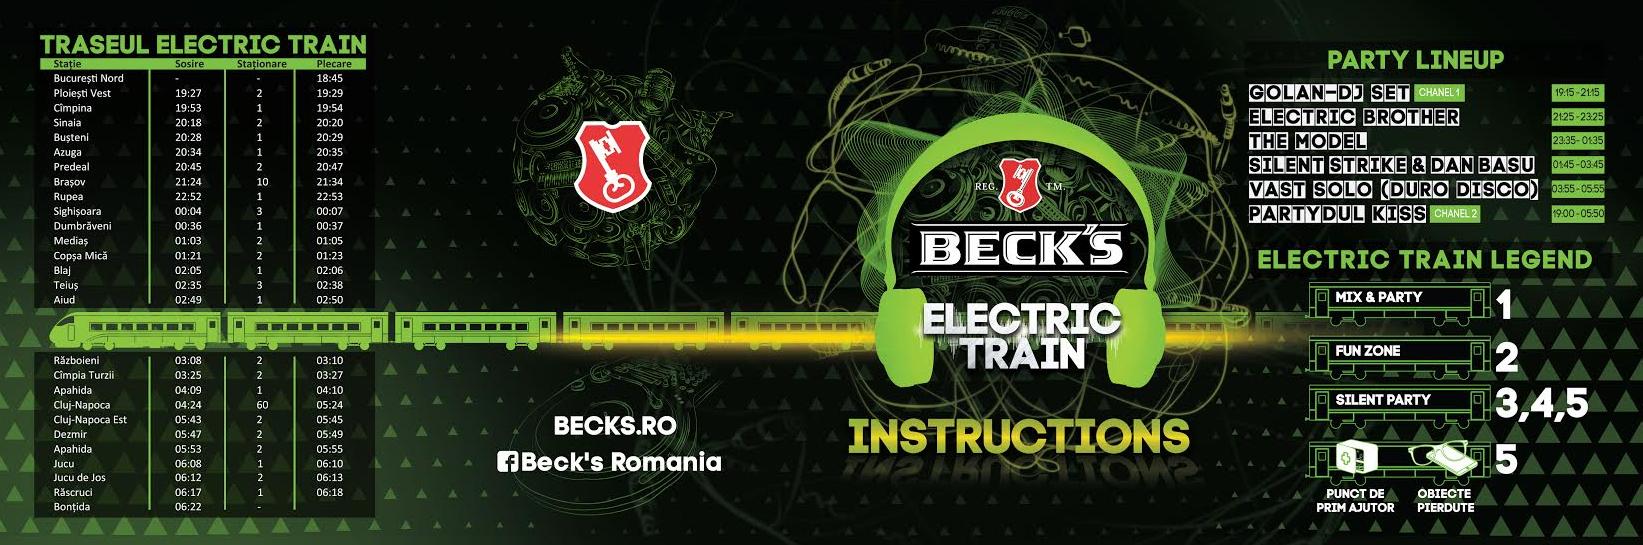 becks electric train